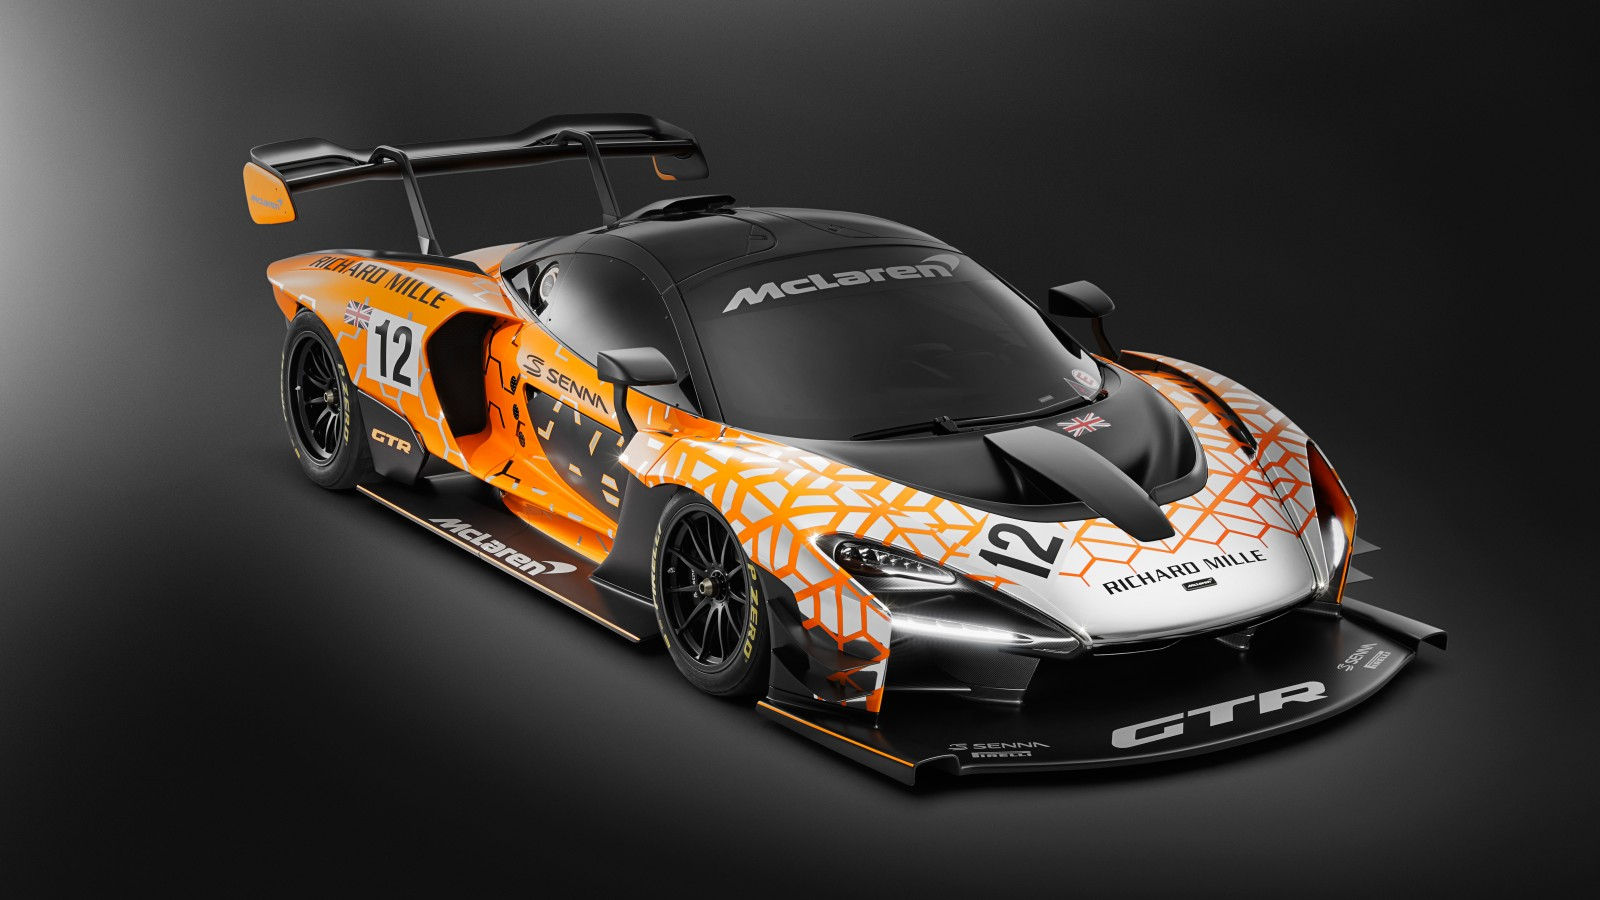 Lotus Car Hd Wallpapers 2019 Mclaren Senna Gtr Concept 5k Wallpaper Hd Car